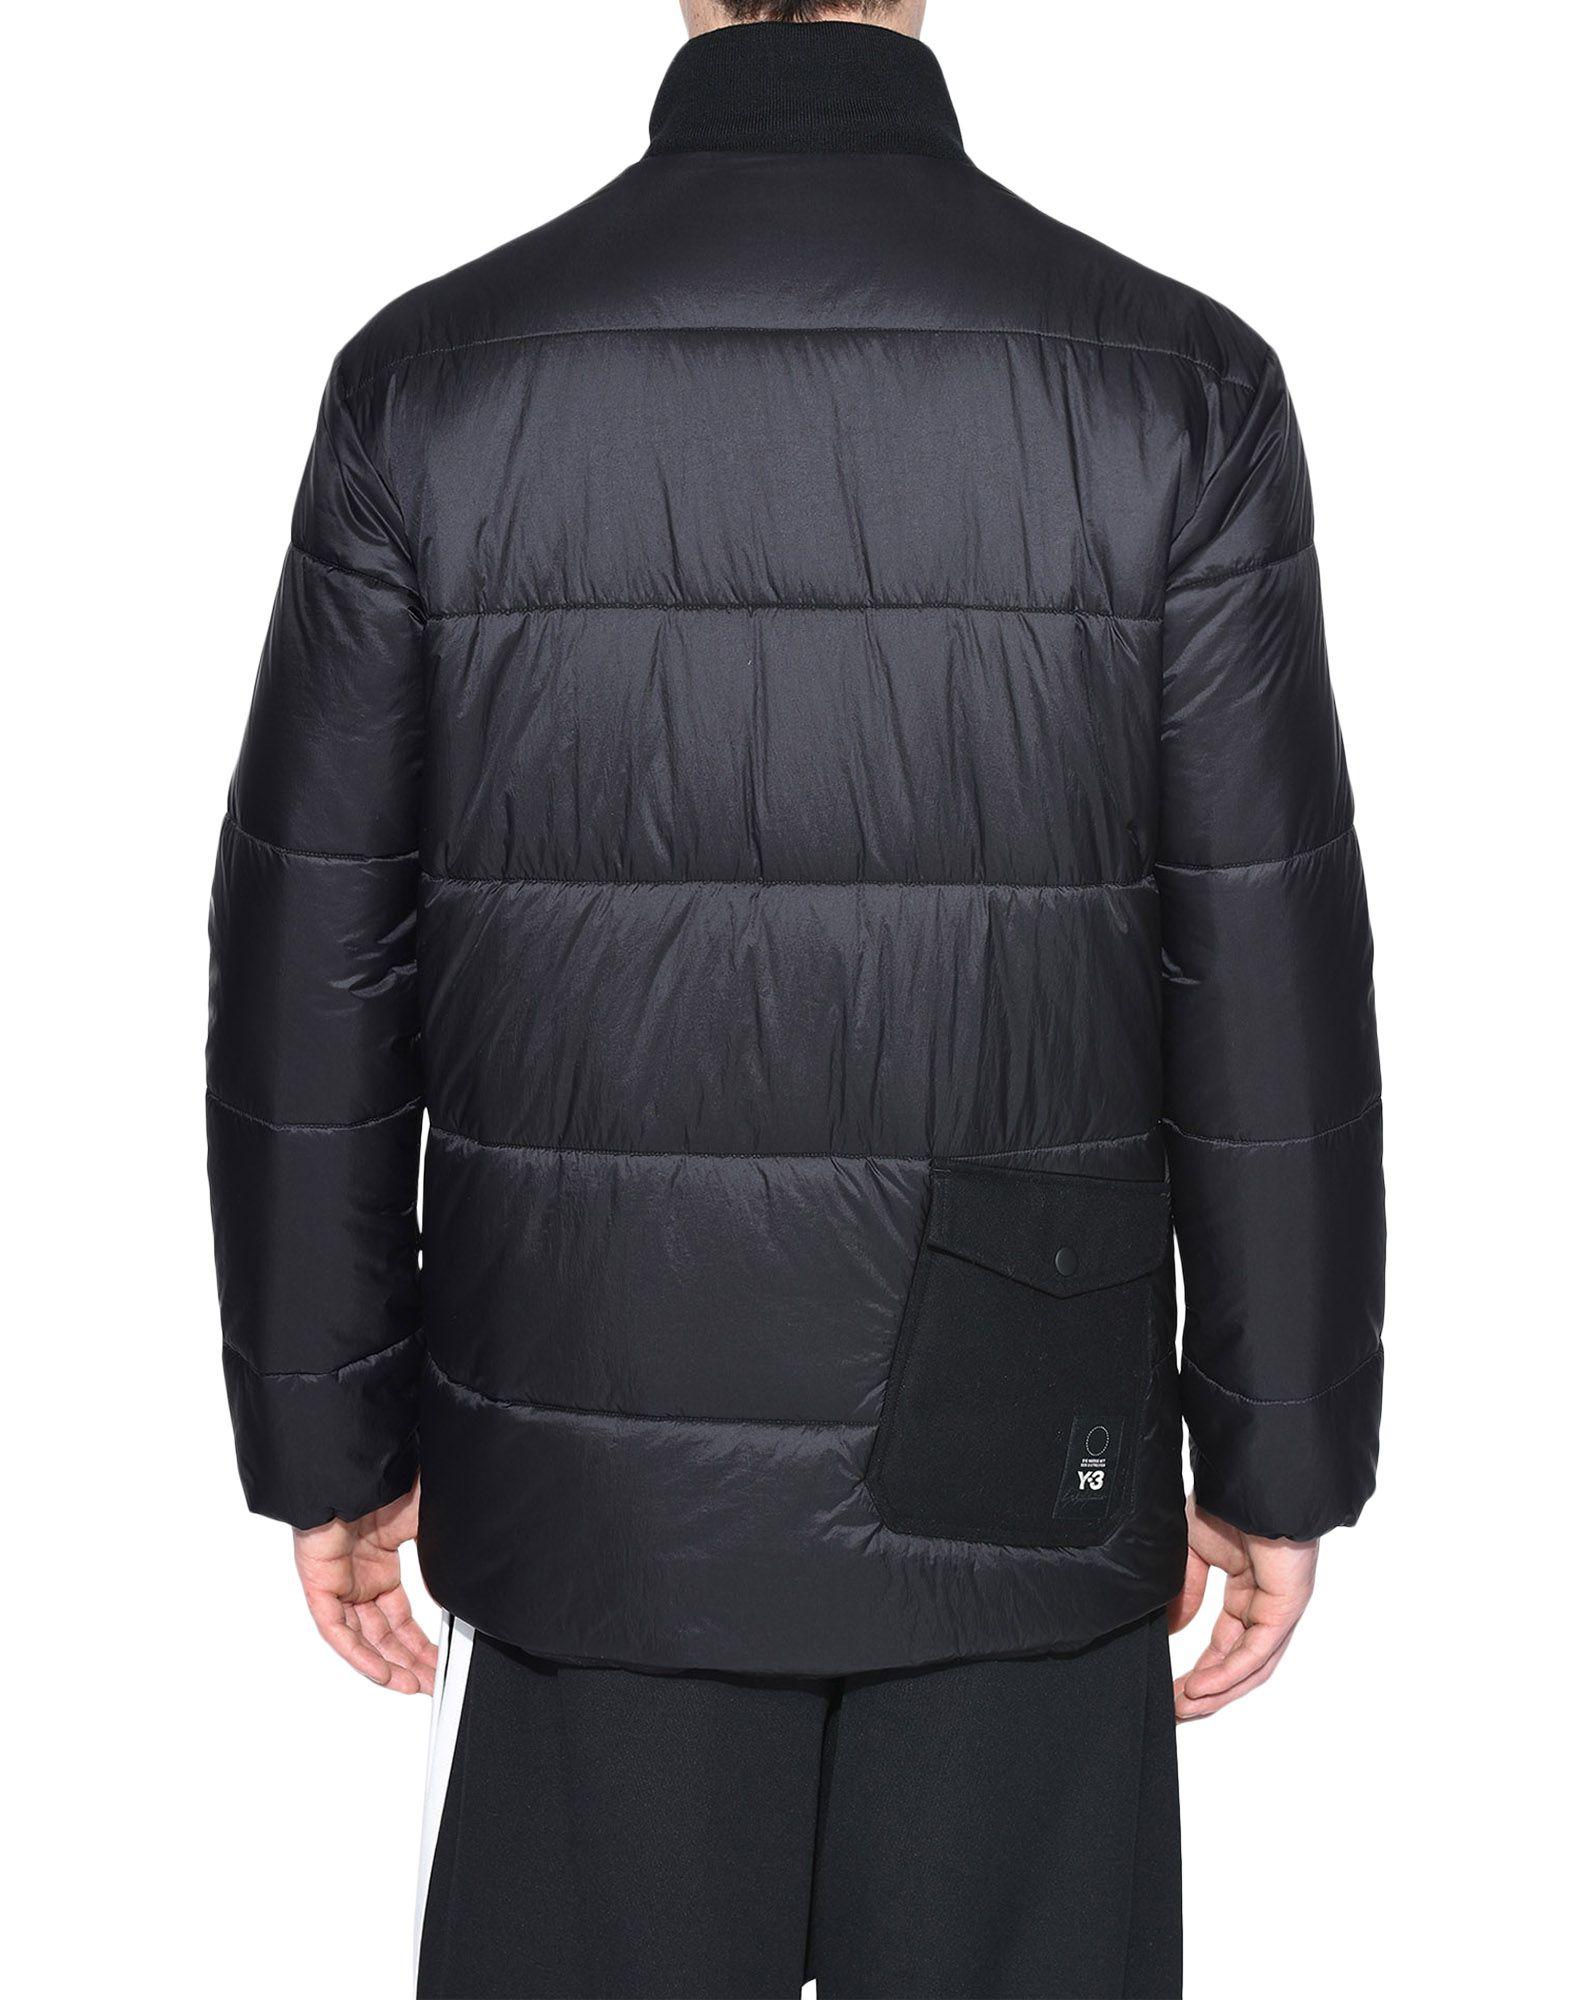 Y-3 Y-3 Patchwork Down Jacket Down jacket Man d